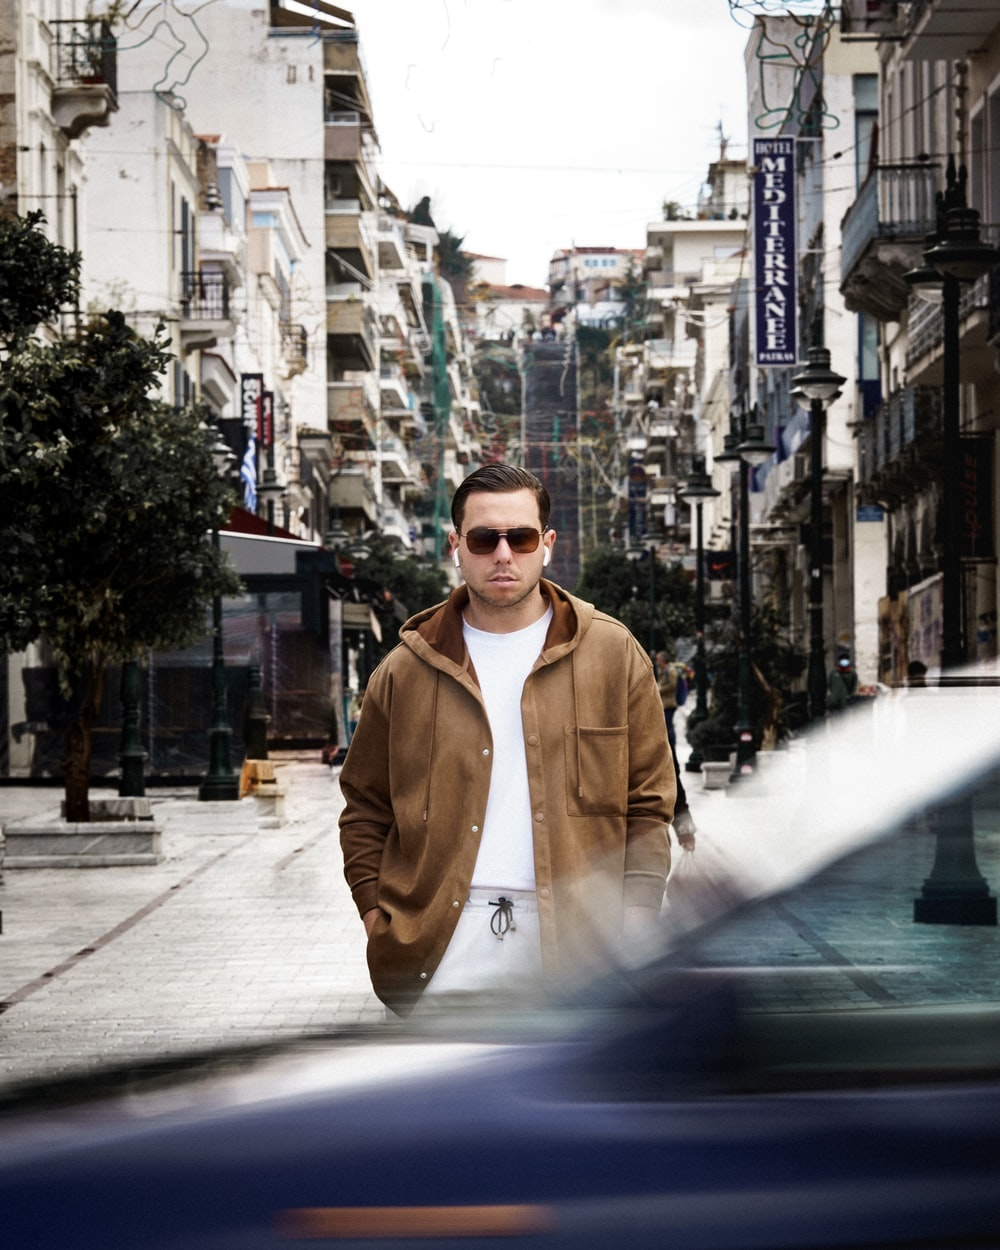 man in brown coat standing on sidewalk during daytime